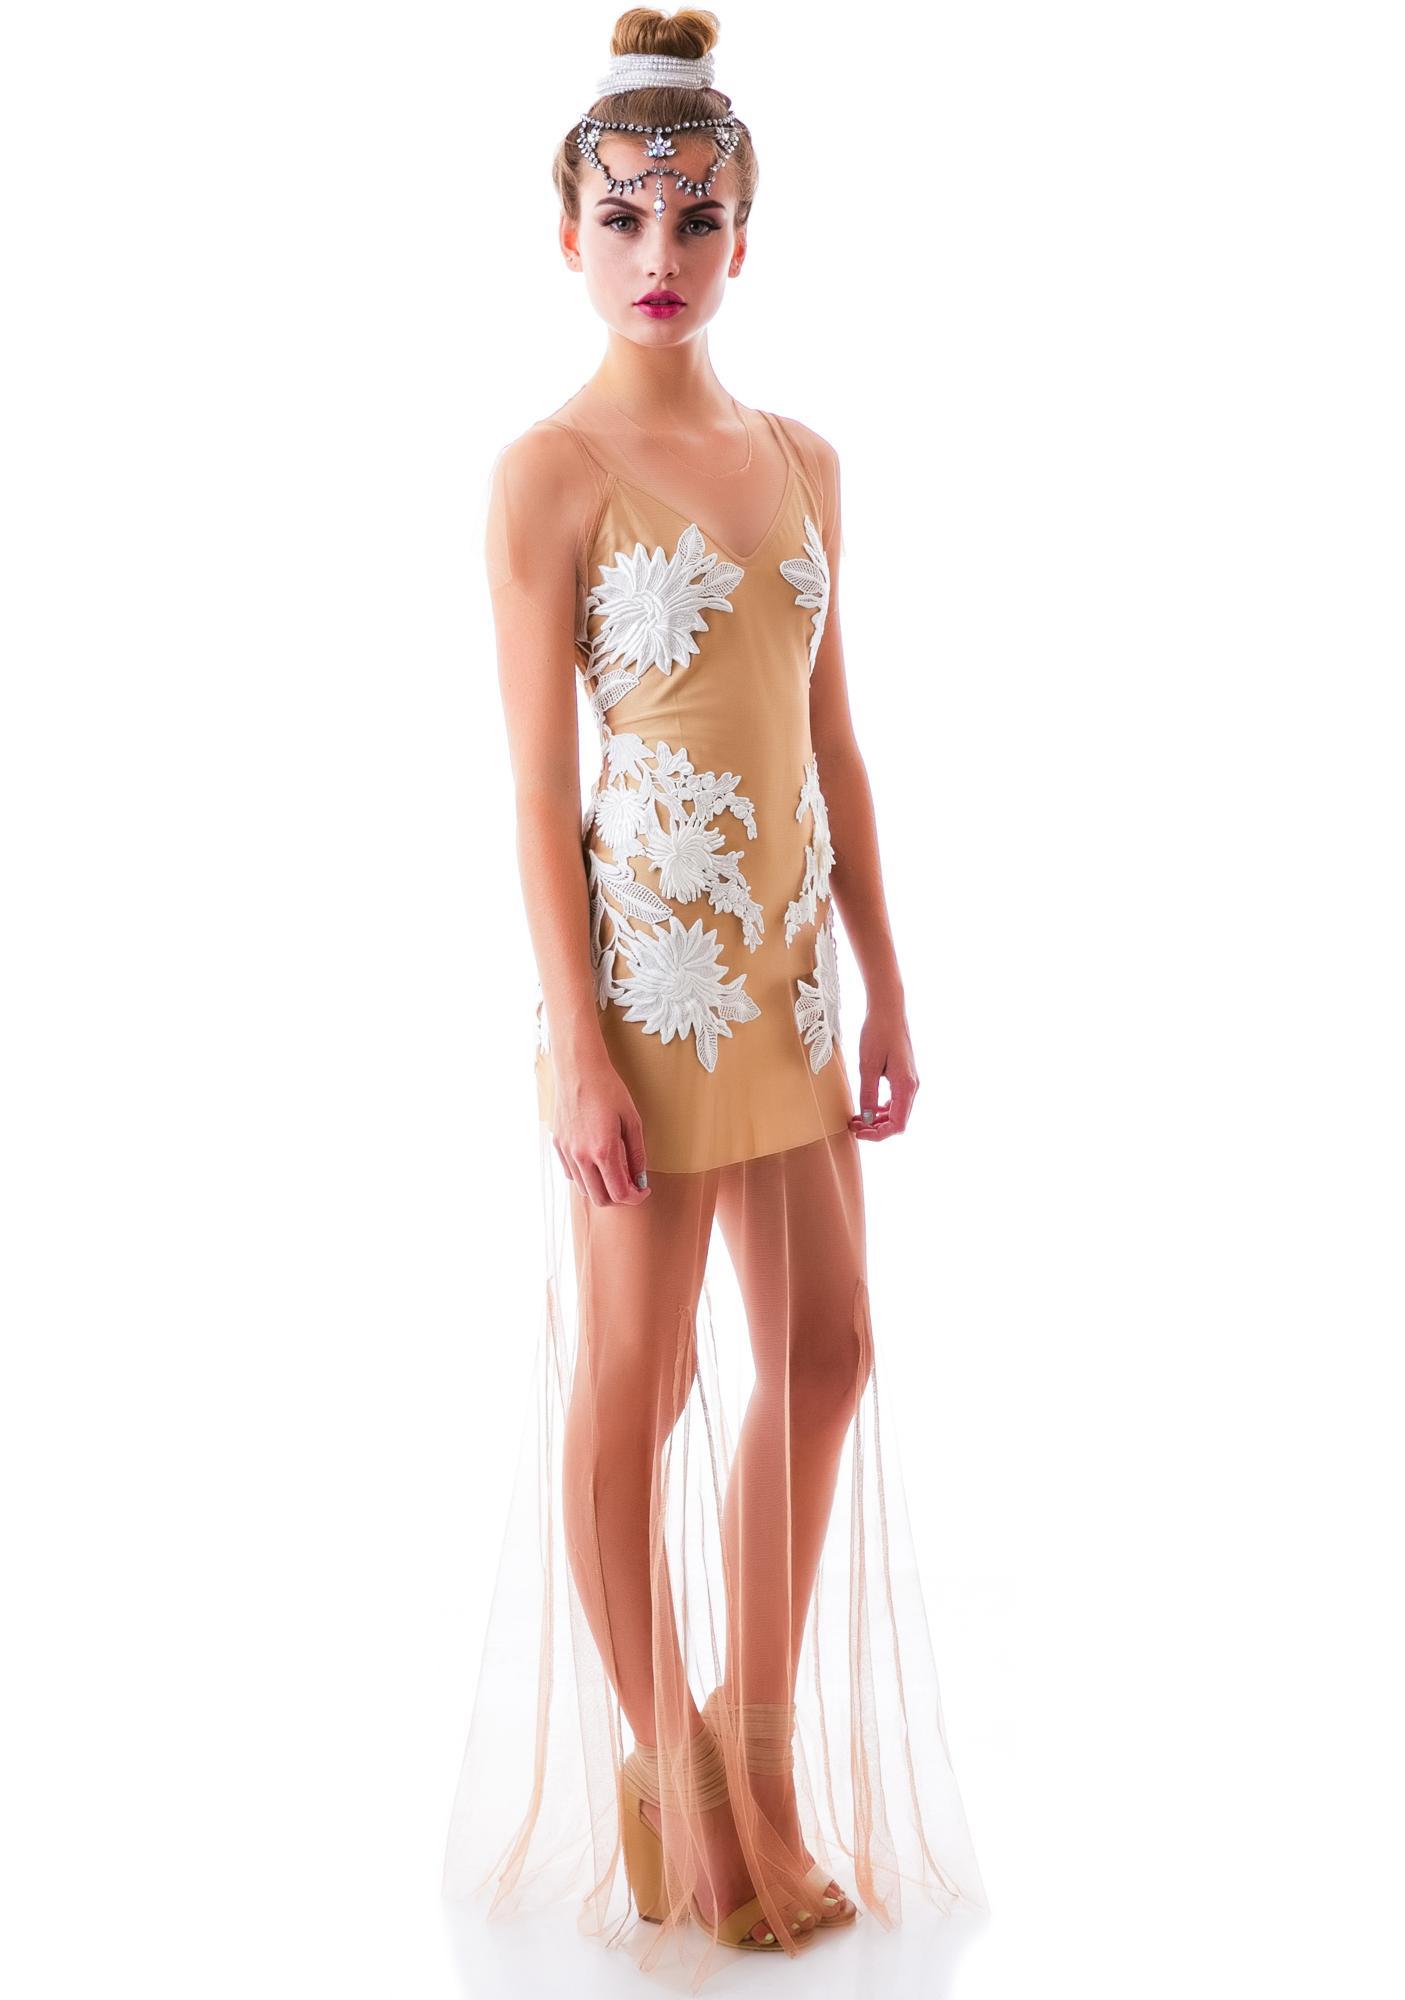 For Love & Lemons Balmy Nights Maxi Dress